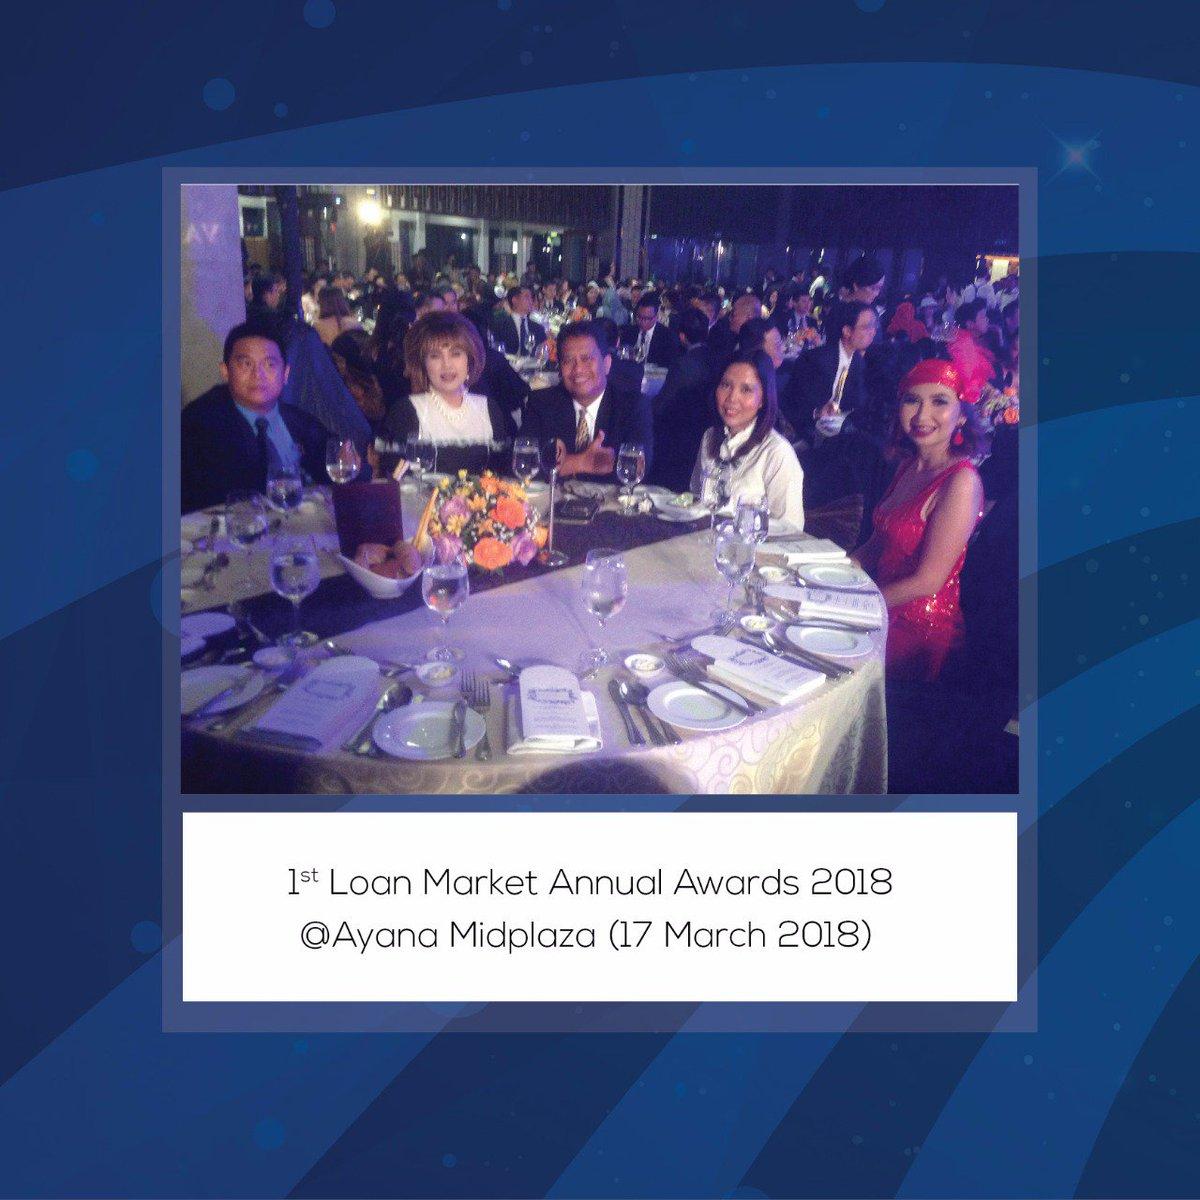 1st Annual Loan Market Award 2018 @ayana midplaza (17 March 2018) . . . #loanmarket #event #1stannualawards #annual #awards #1st #loanmarketindonesia #finance #business #professional #ayana #loan #marketpic.twitter.com/bIJuJZywDD